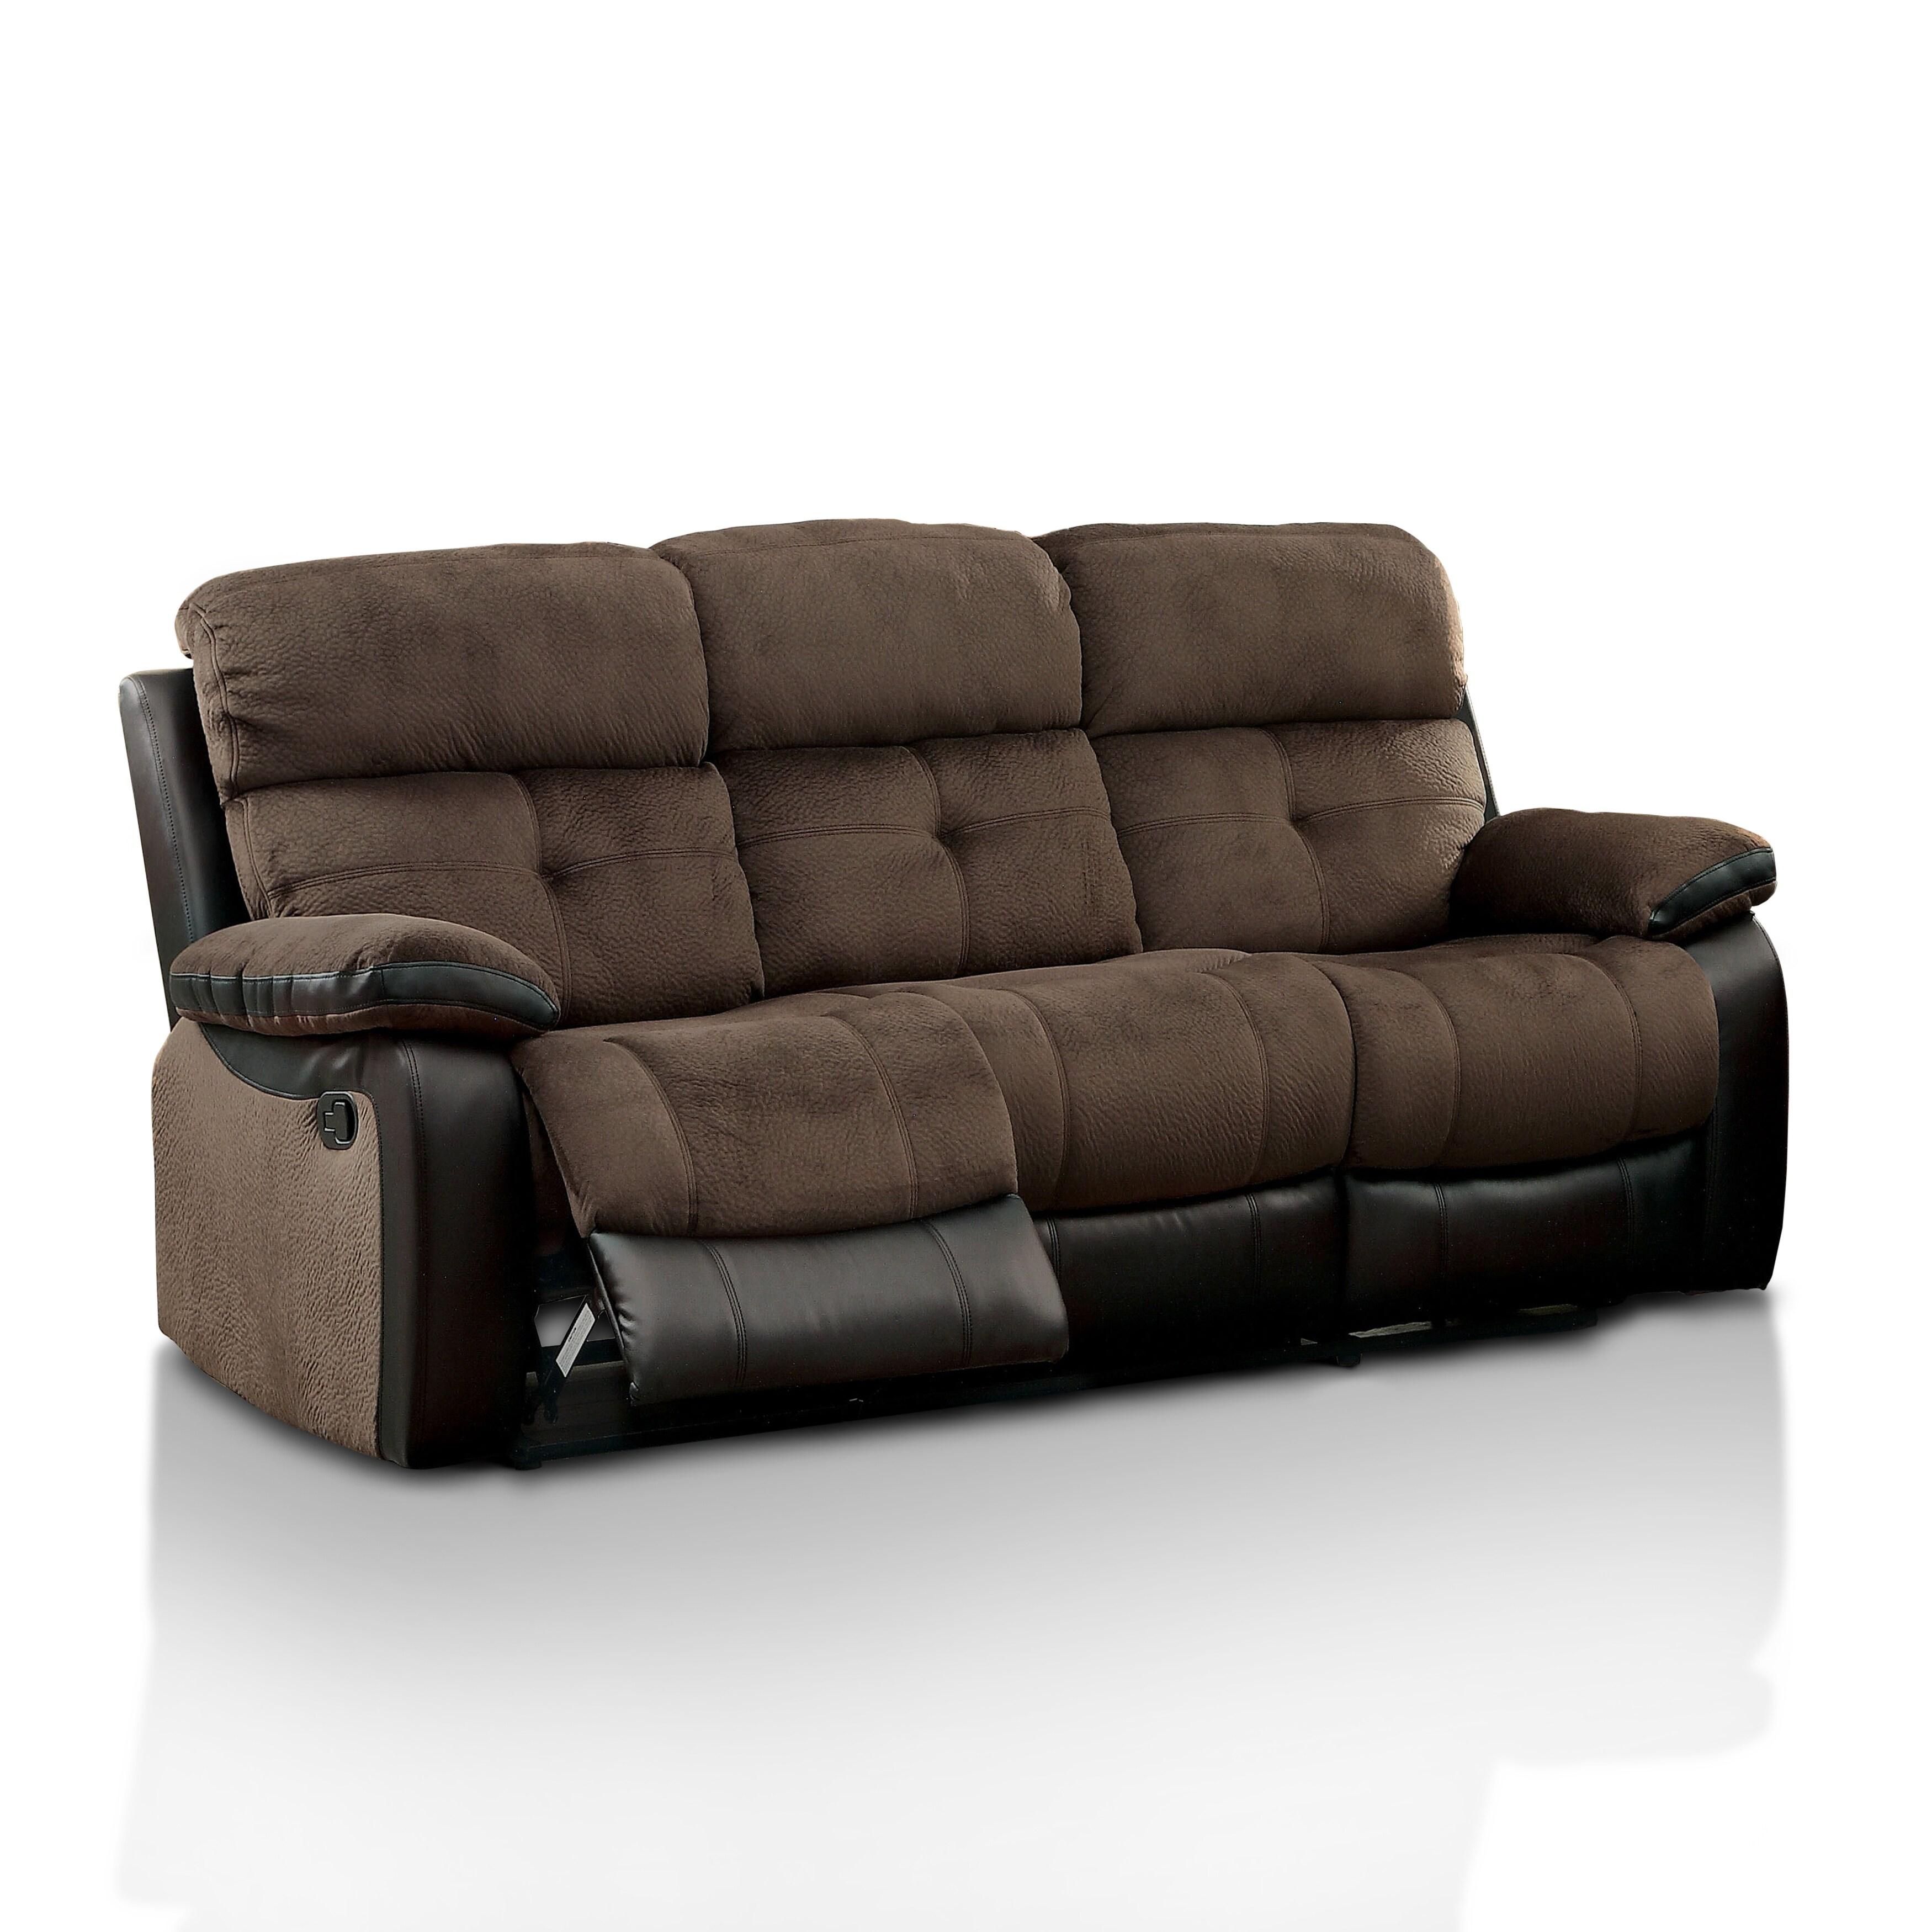 Furniture Of America Ferg Contemporary Brown Fabric Reclining Sofa